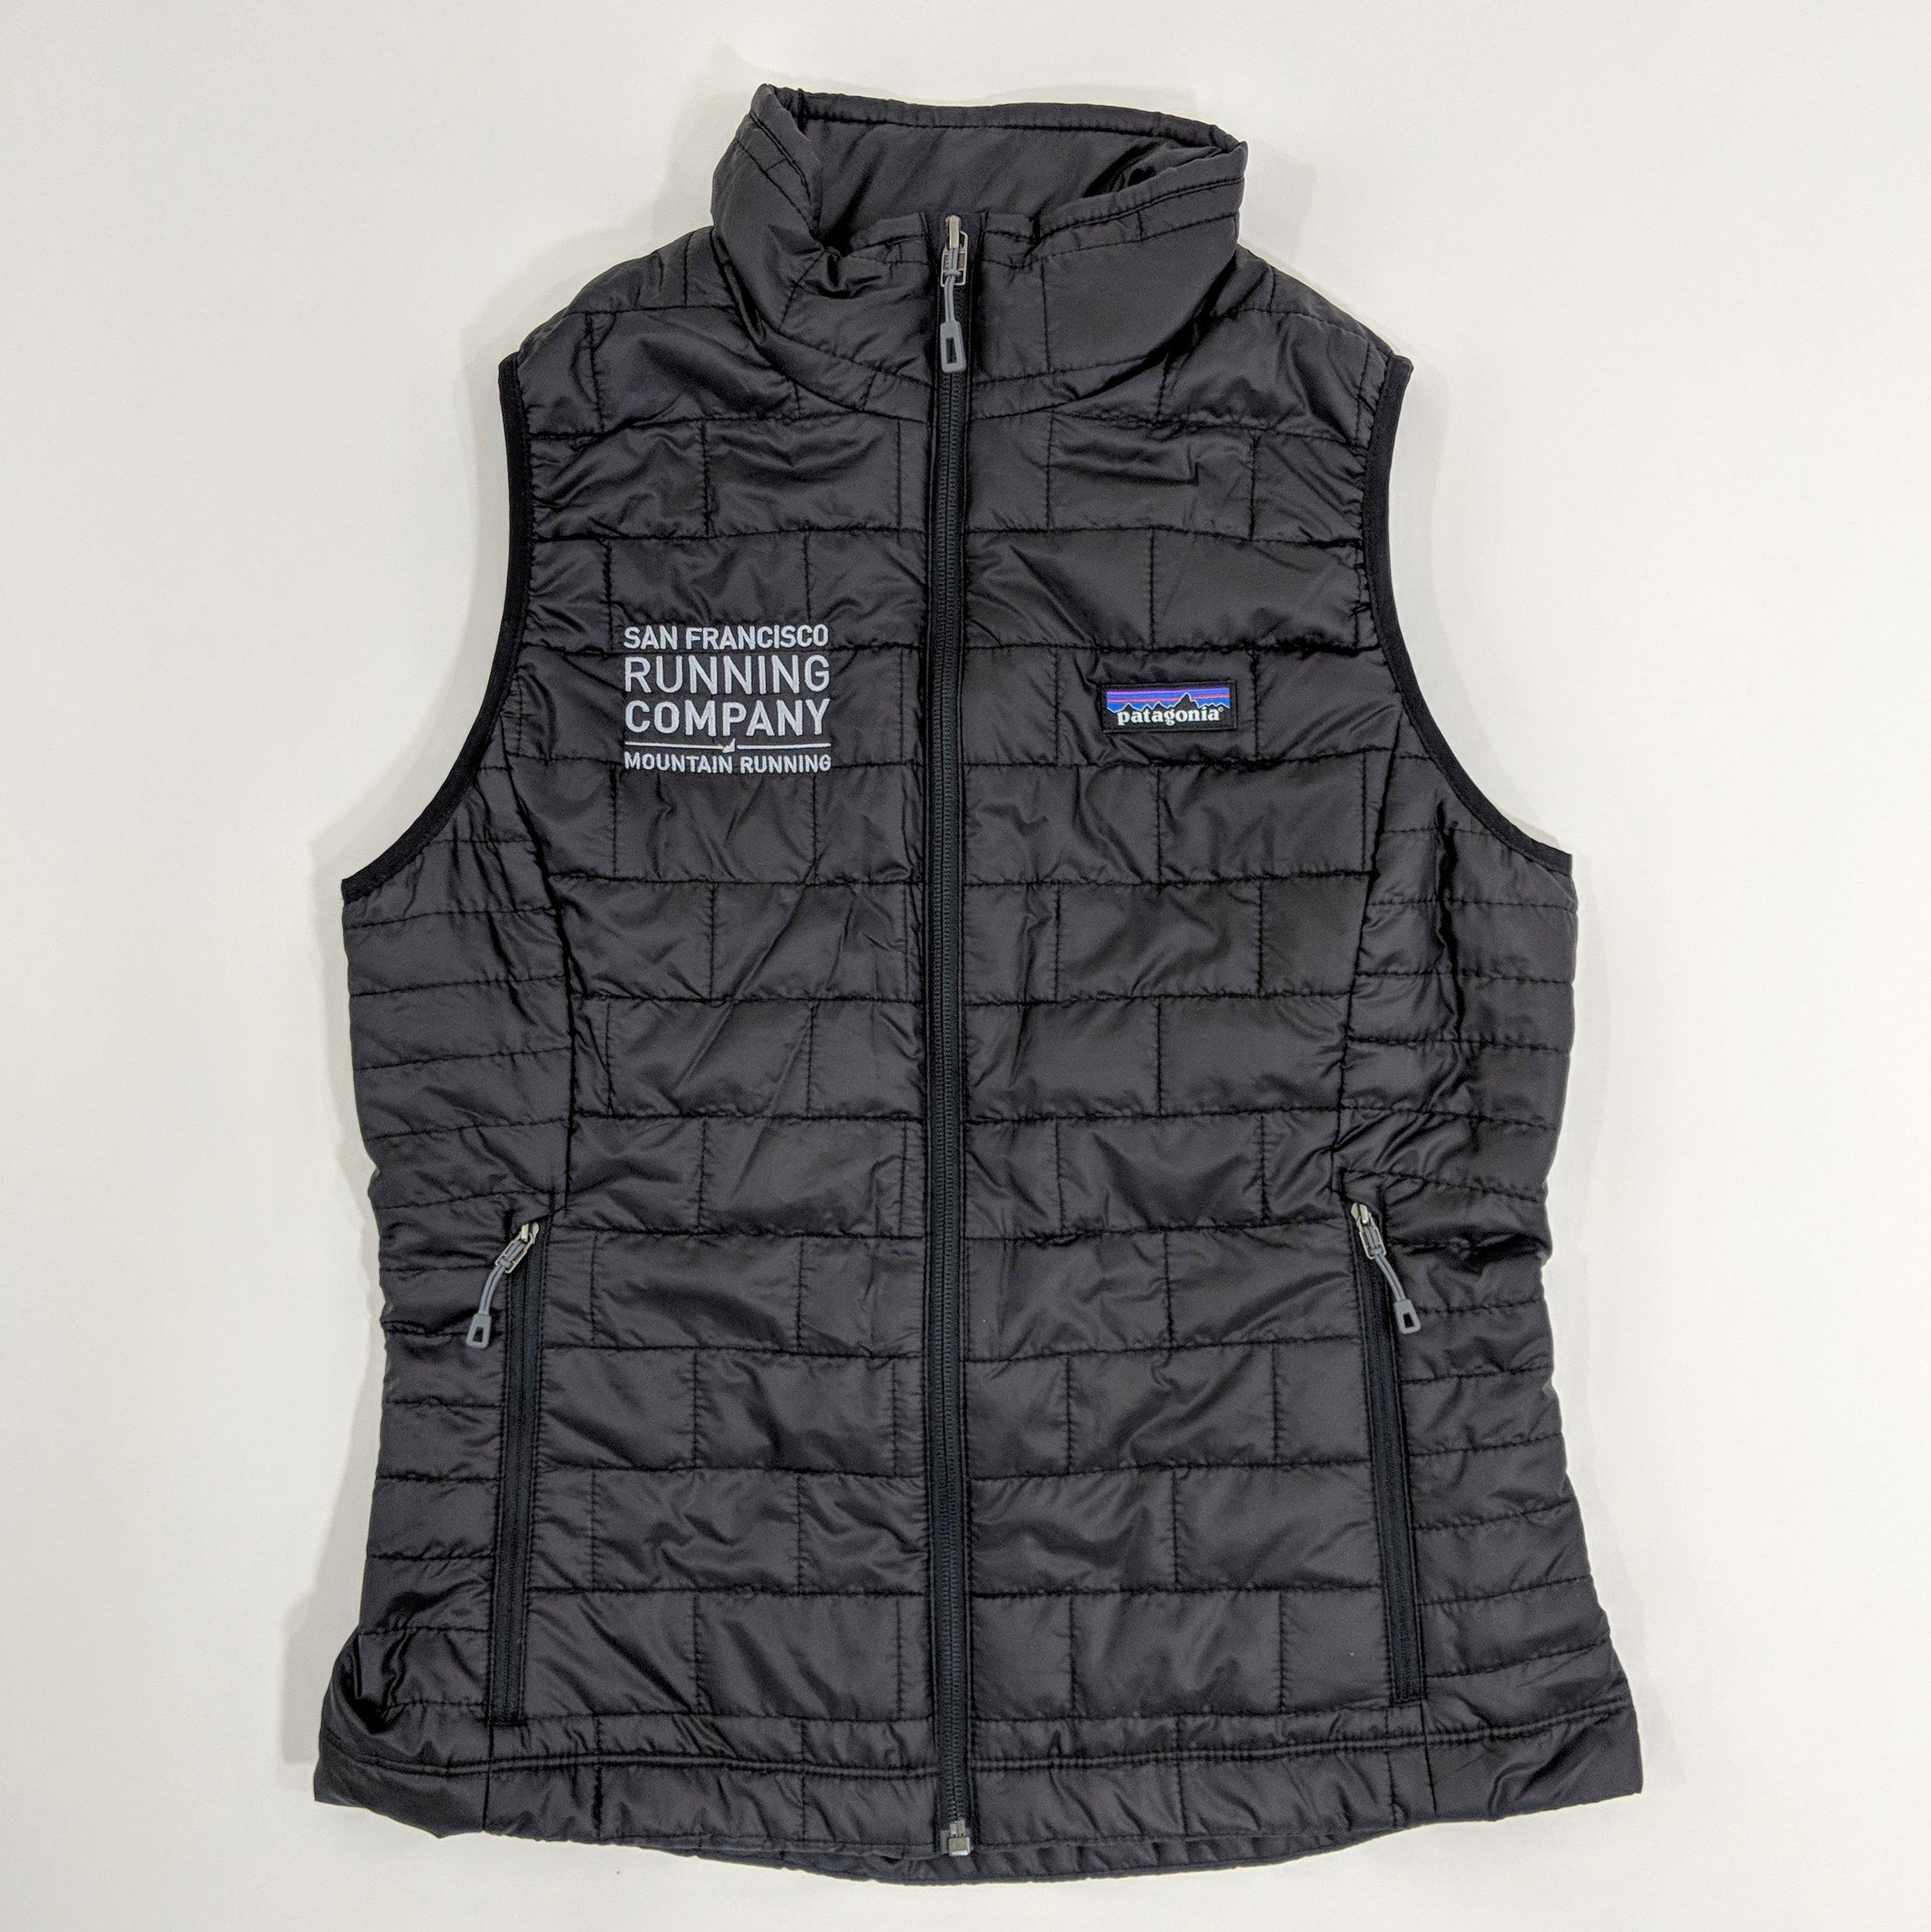 007cdb4f9 Womens Patagonia SFRC Nano Puff Vest - Black — San Francisco Running Company